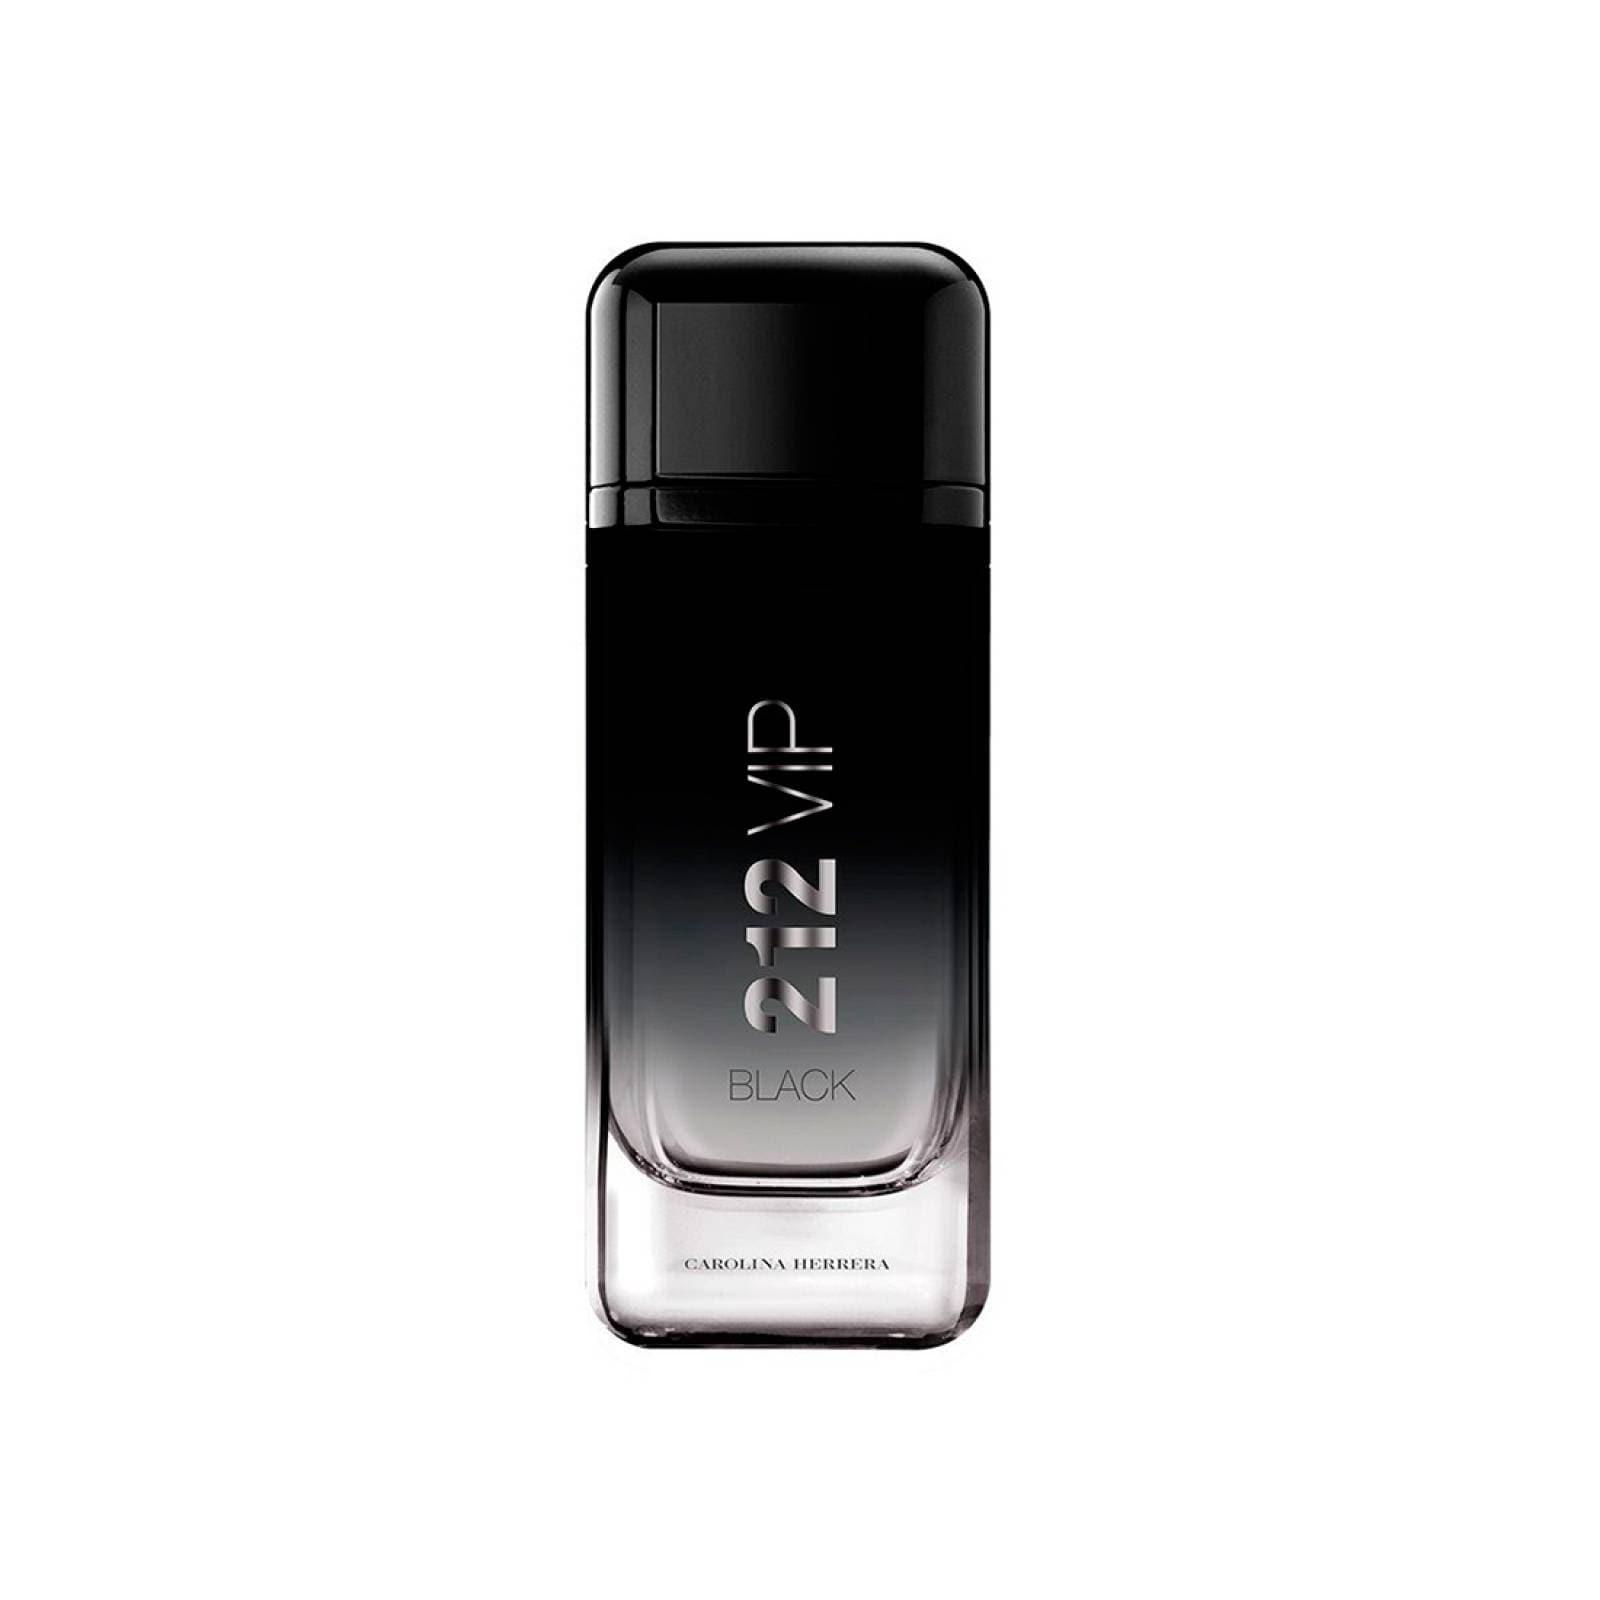 212 VIP BLACK -CAROLINA HERRERA - EDP SPRAY 200ML